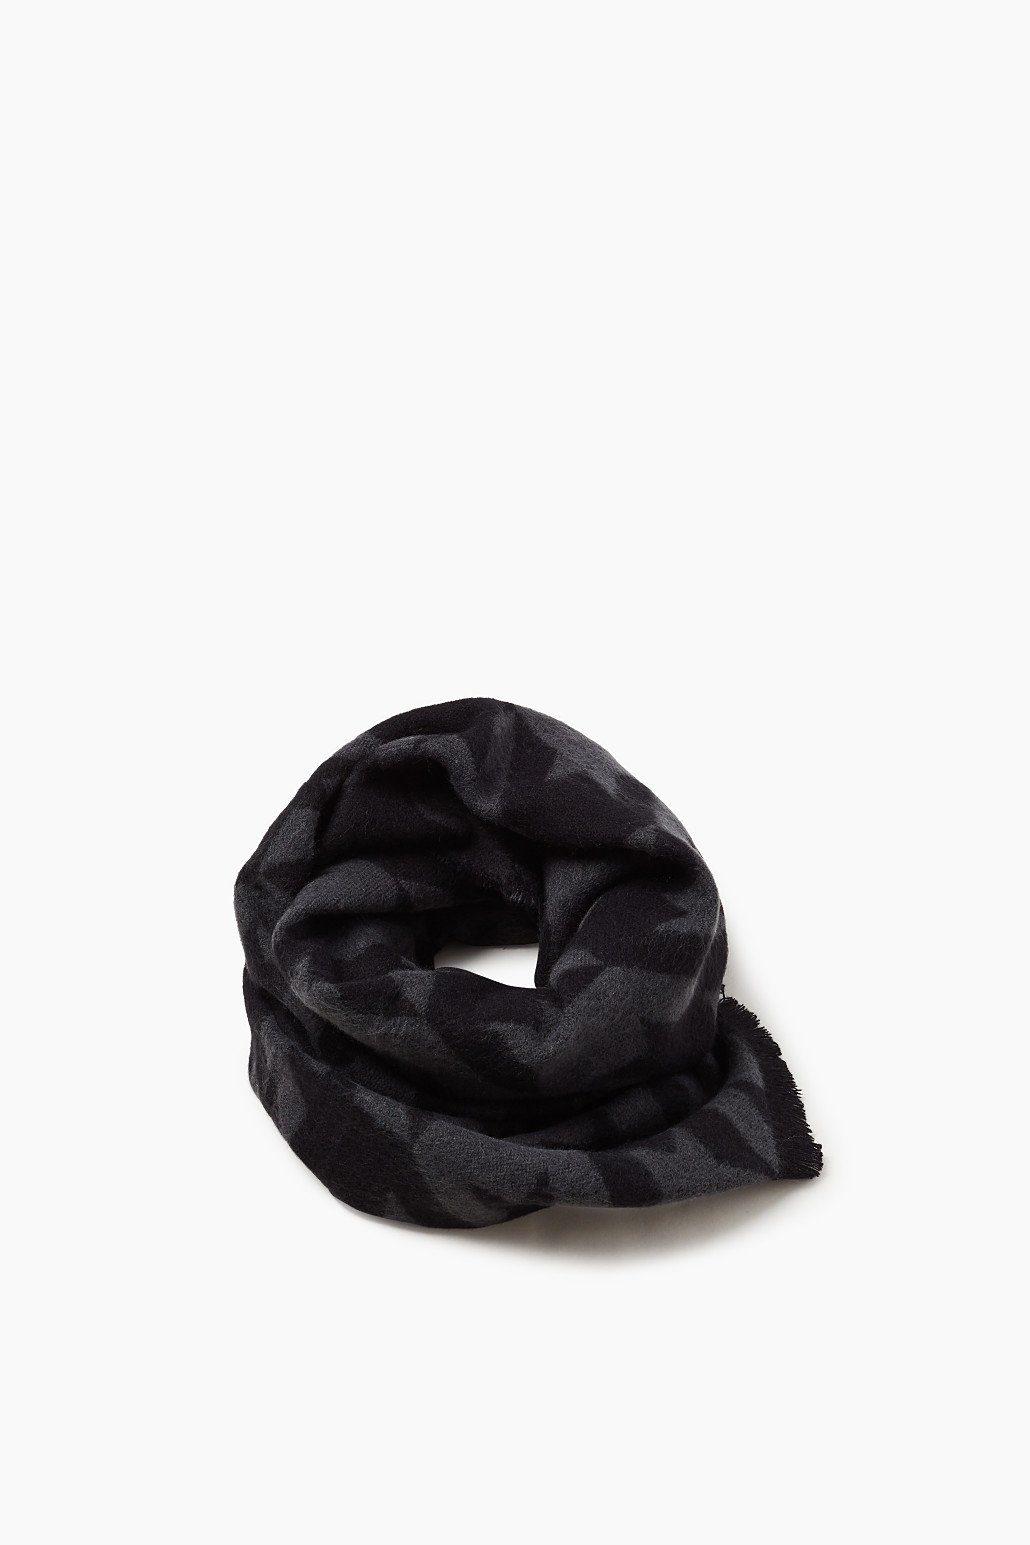 ESPRIT CASUAL Schal mit markantem Hahnentritt-Muster